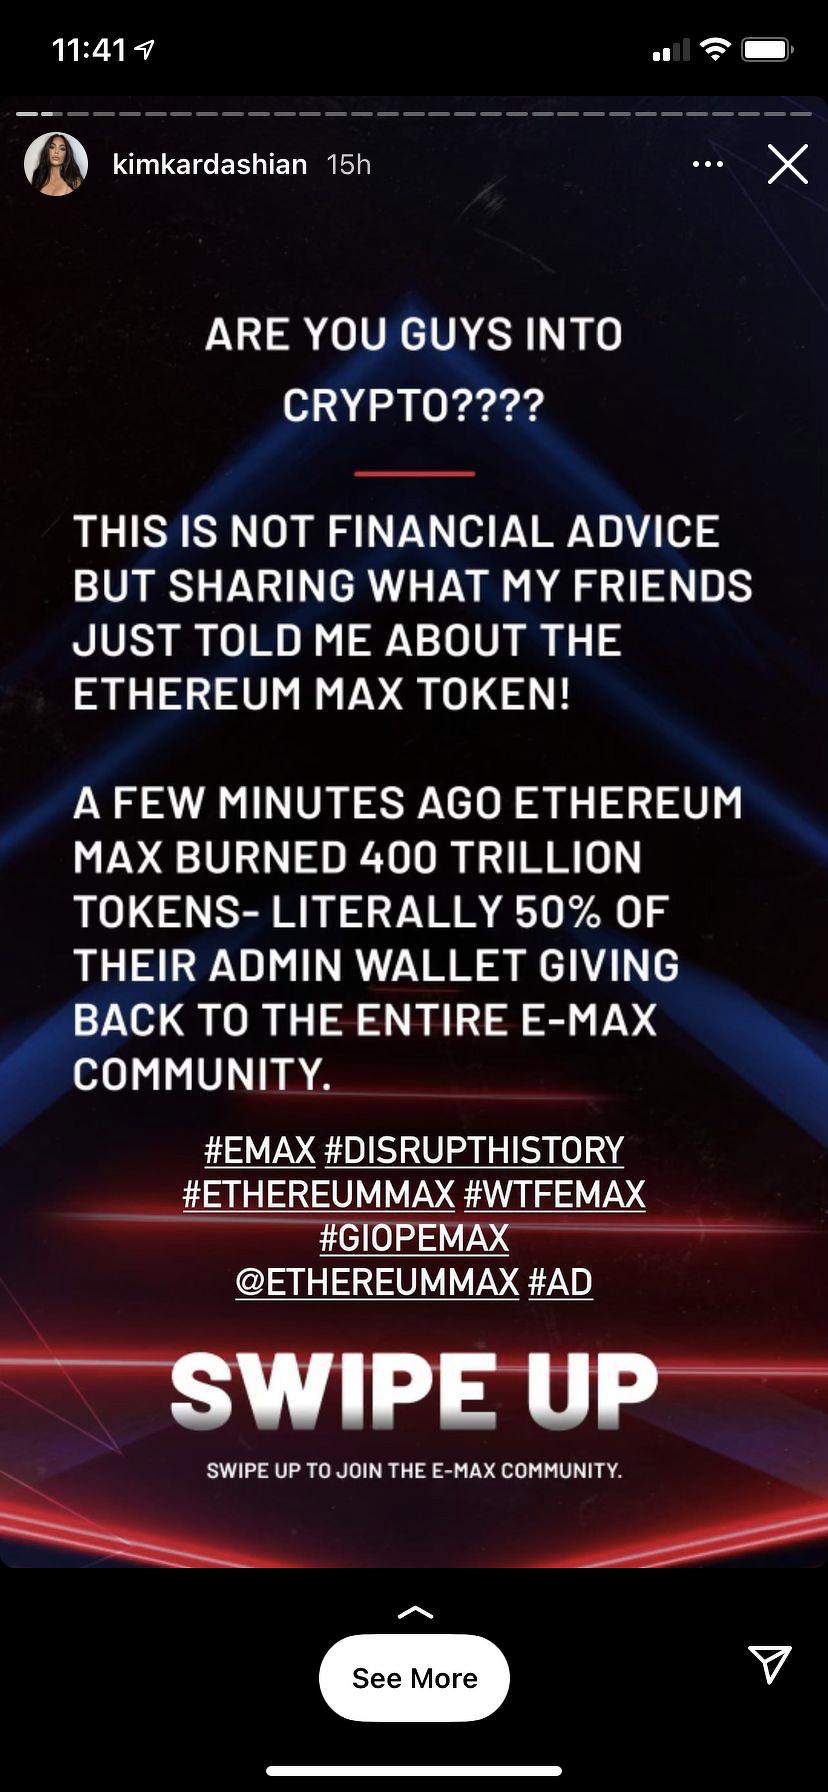 promocja ethereum max na ig